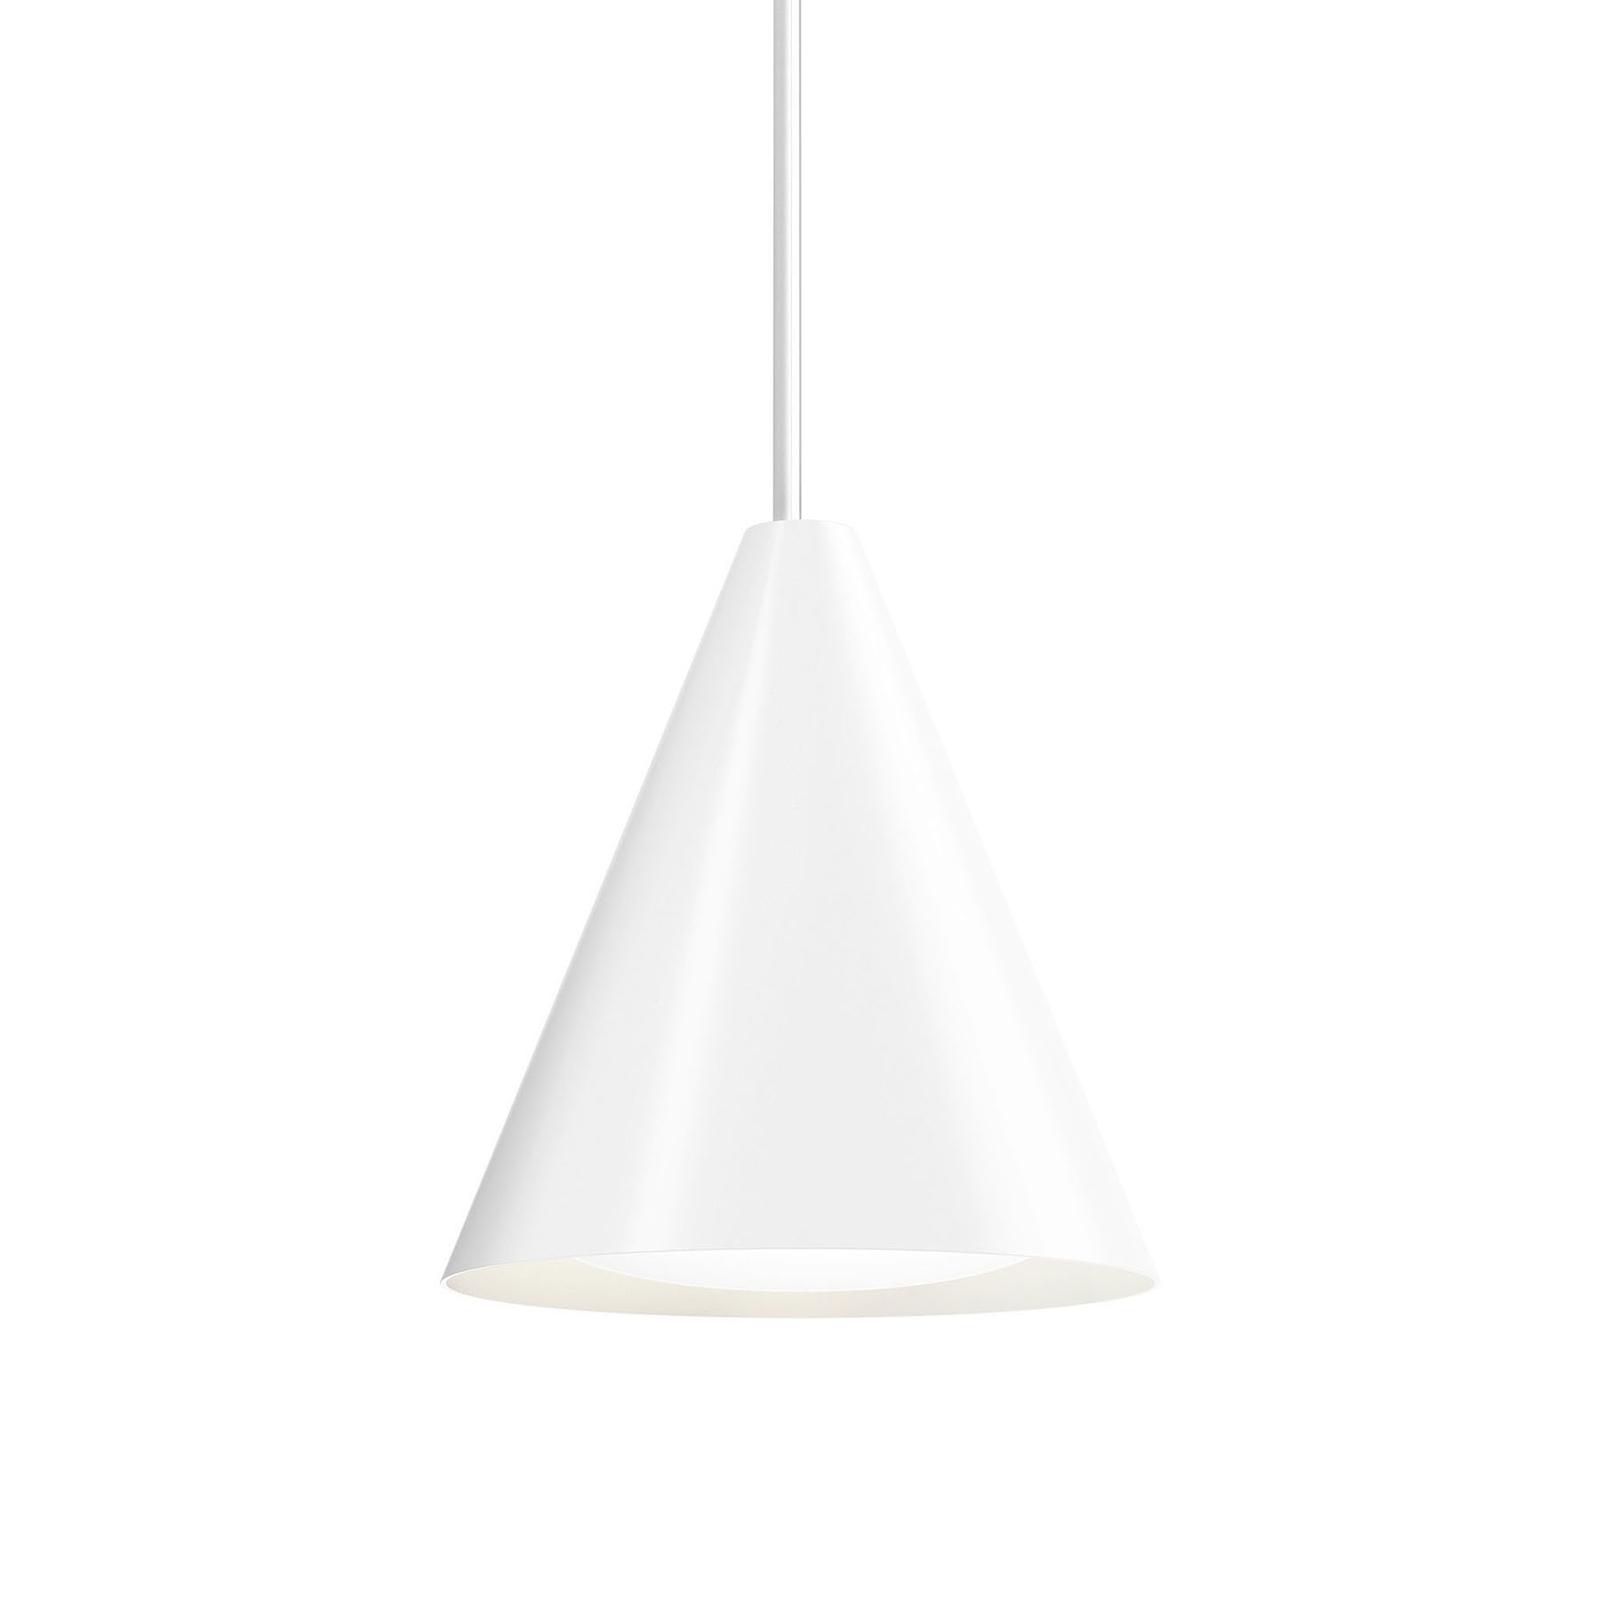 Louis Poulsen Keglen LED hanglamp 25cm wit